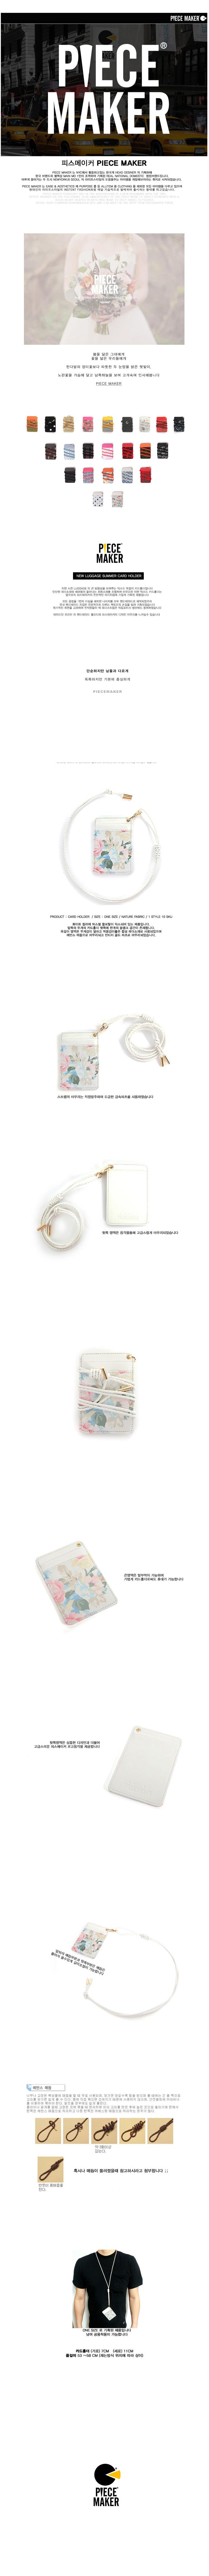 NO.2 NATURAL FLORAL CARD HOLDER (WHITE)23,000원-피스메이커패션잡화, 지갑, 동전/카드지갑, 목걸이형카드지갑바보사랑NO.2 NATURAL FLORAL CARD HOLDER (WHITE)23,000원-피스메이커패션잡화, 지갑, 동전/카드지갑, 목걸이형카드지갑바보사랑